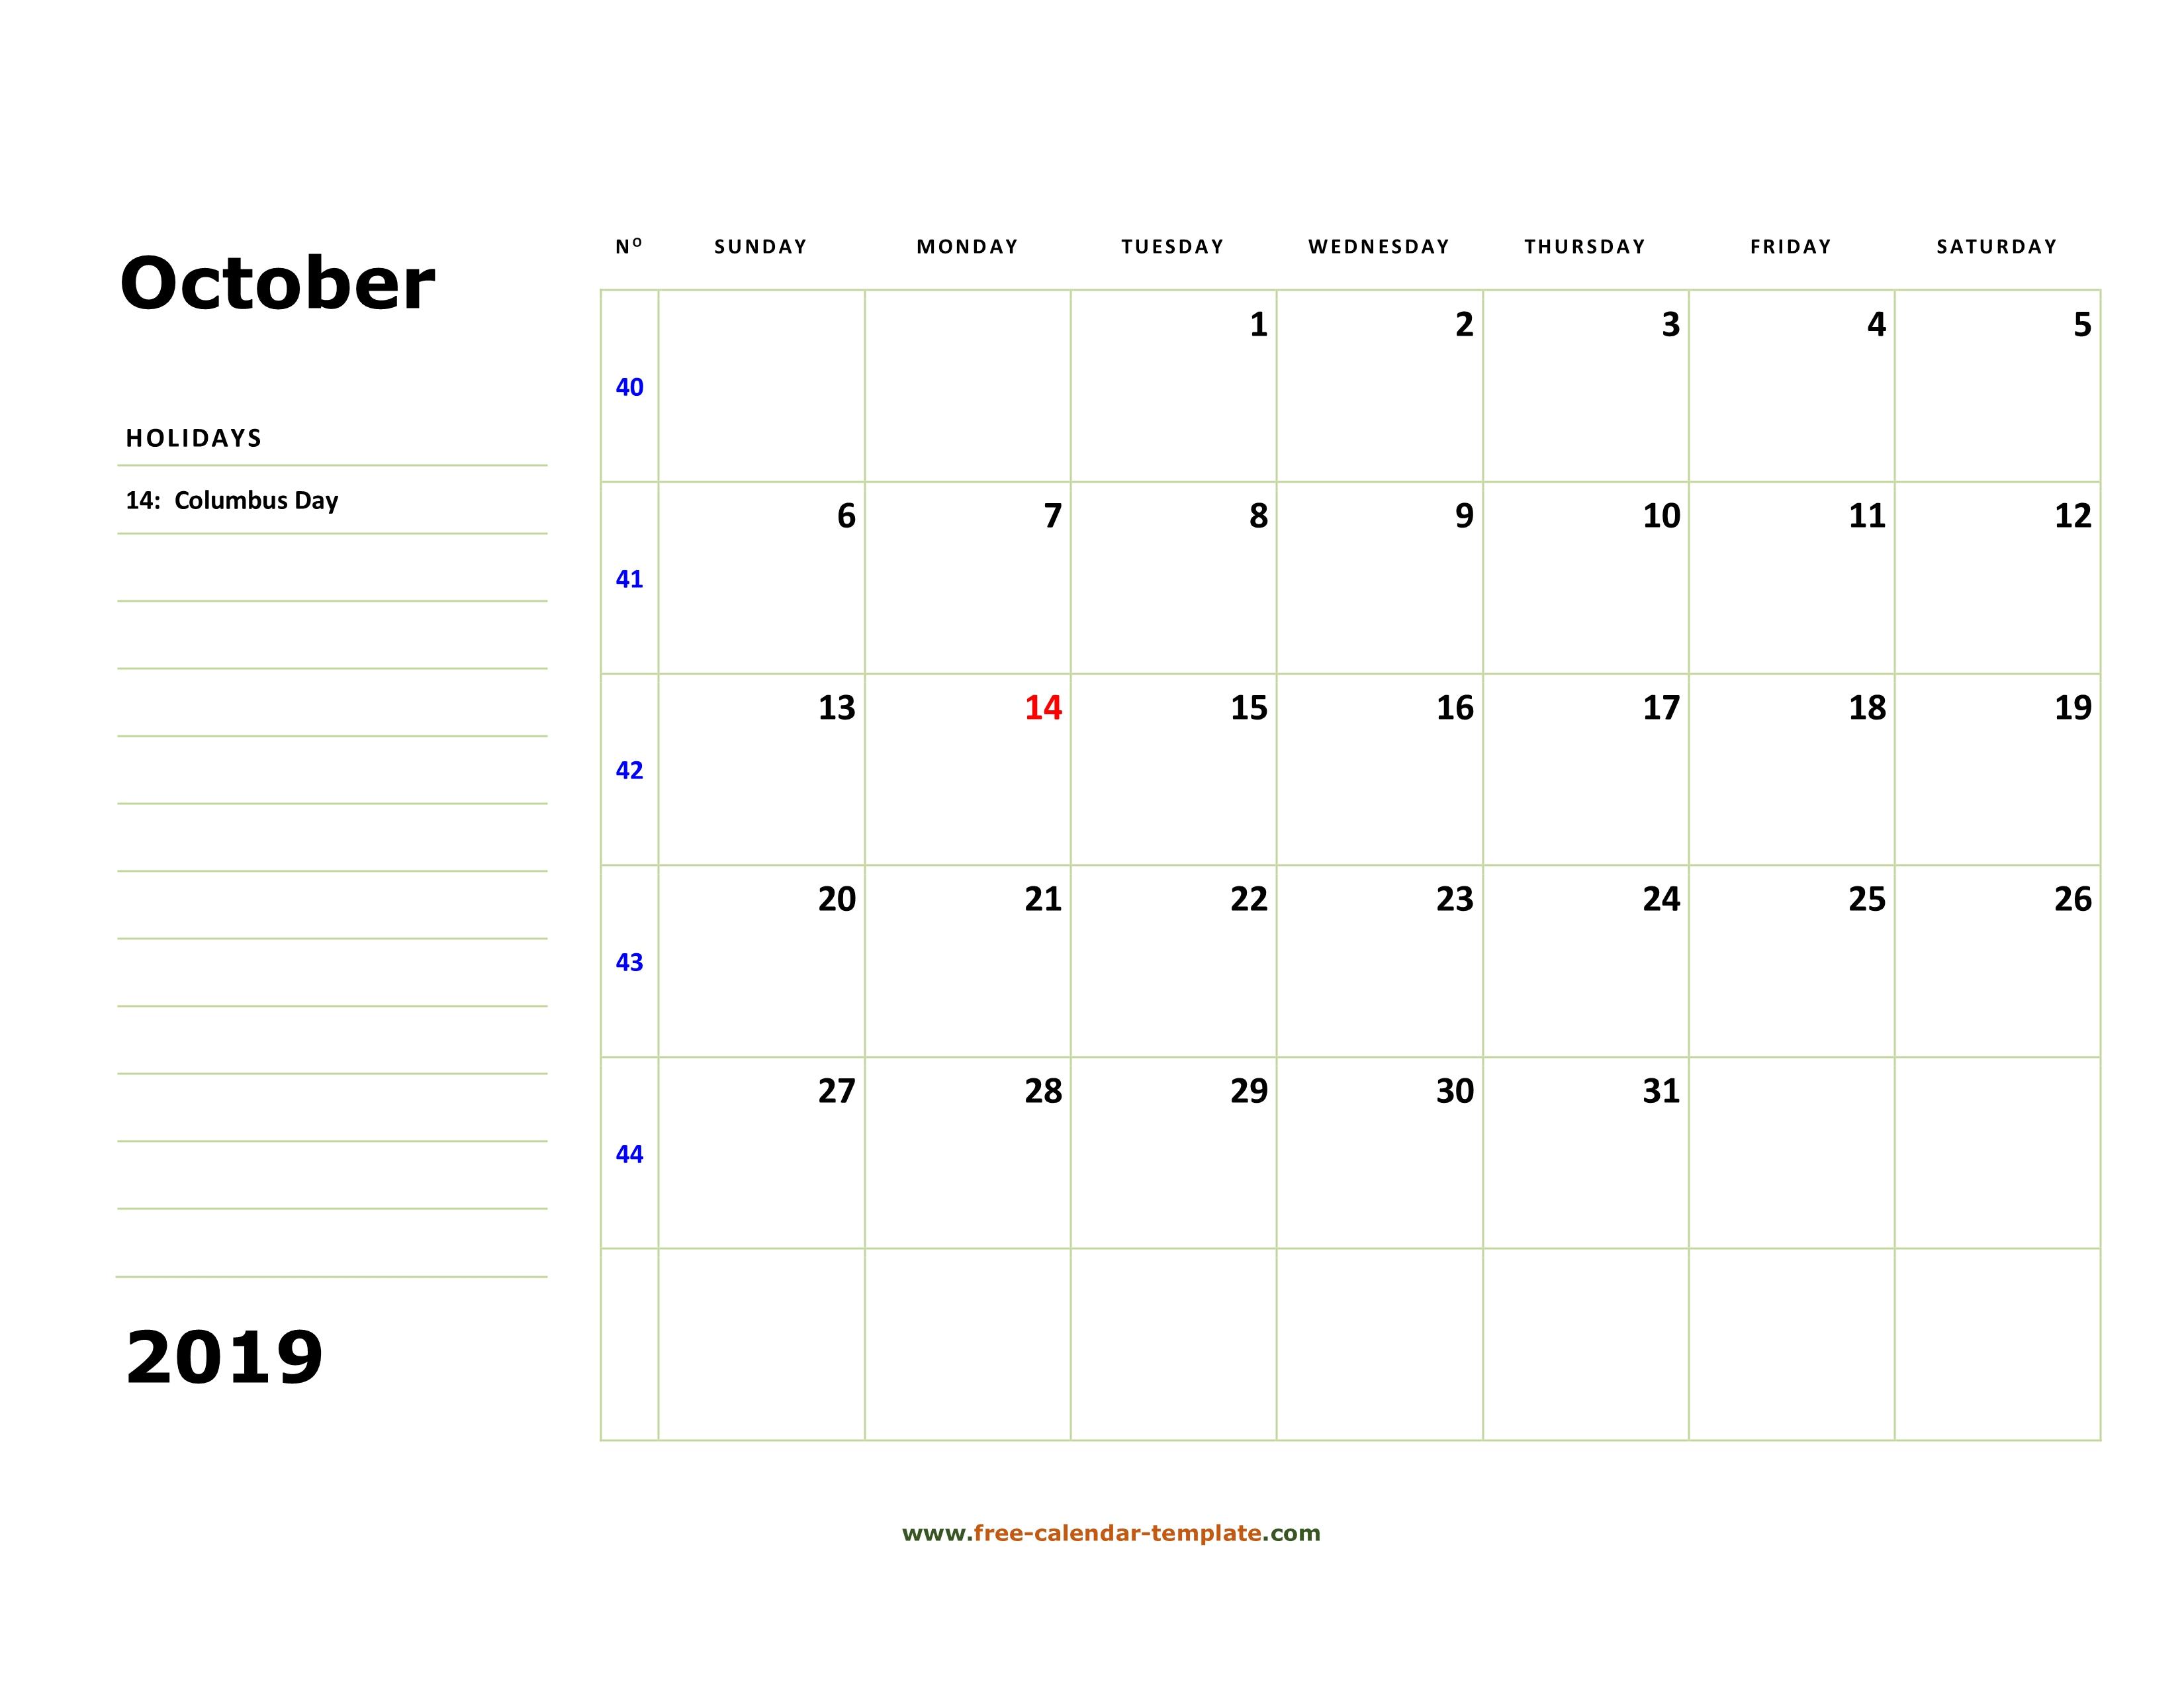 October 2019 Free Calendar Tempplate | Free-Calendar